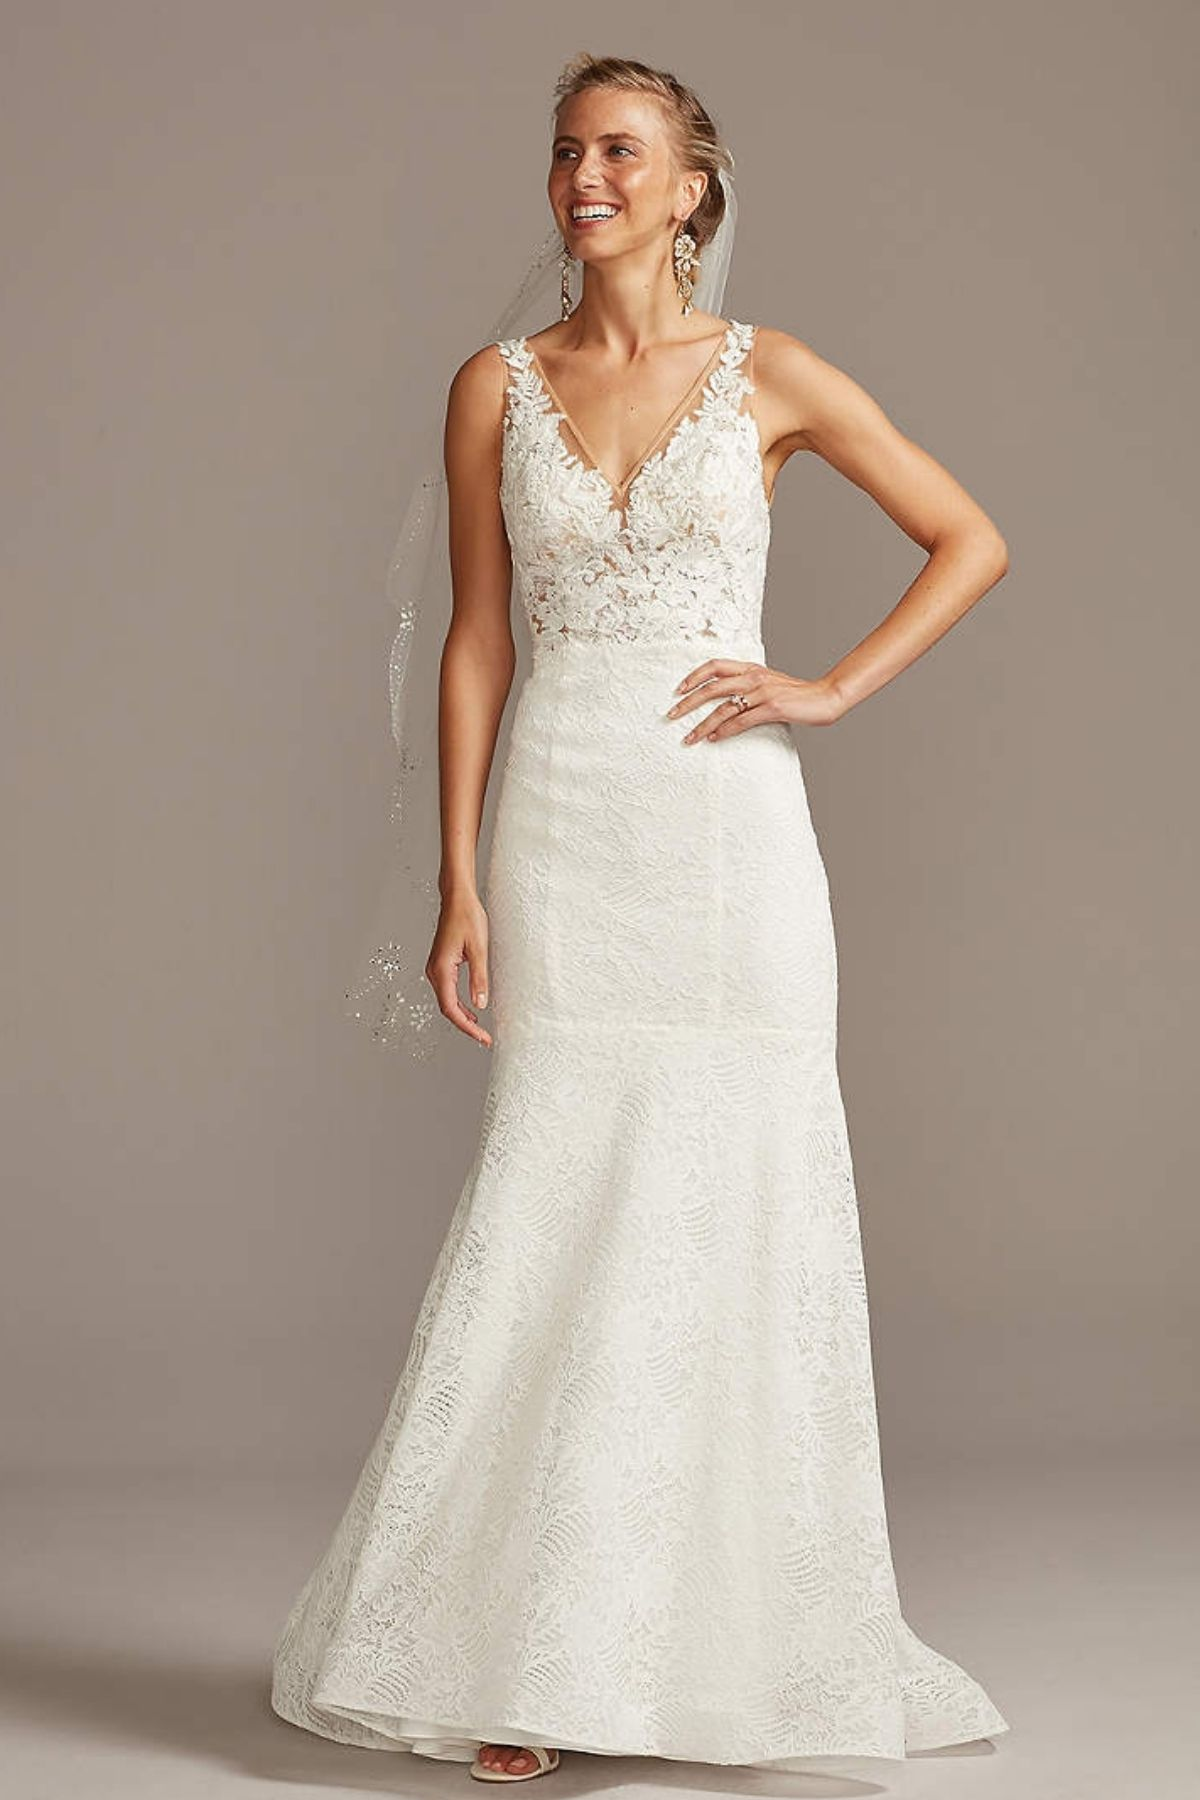 10. Floral Applique Illusion V-Back Wedding Dress - Mermaid Style Bridal Dresses under $800: Top 10 from David's Bridal